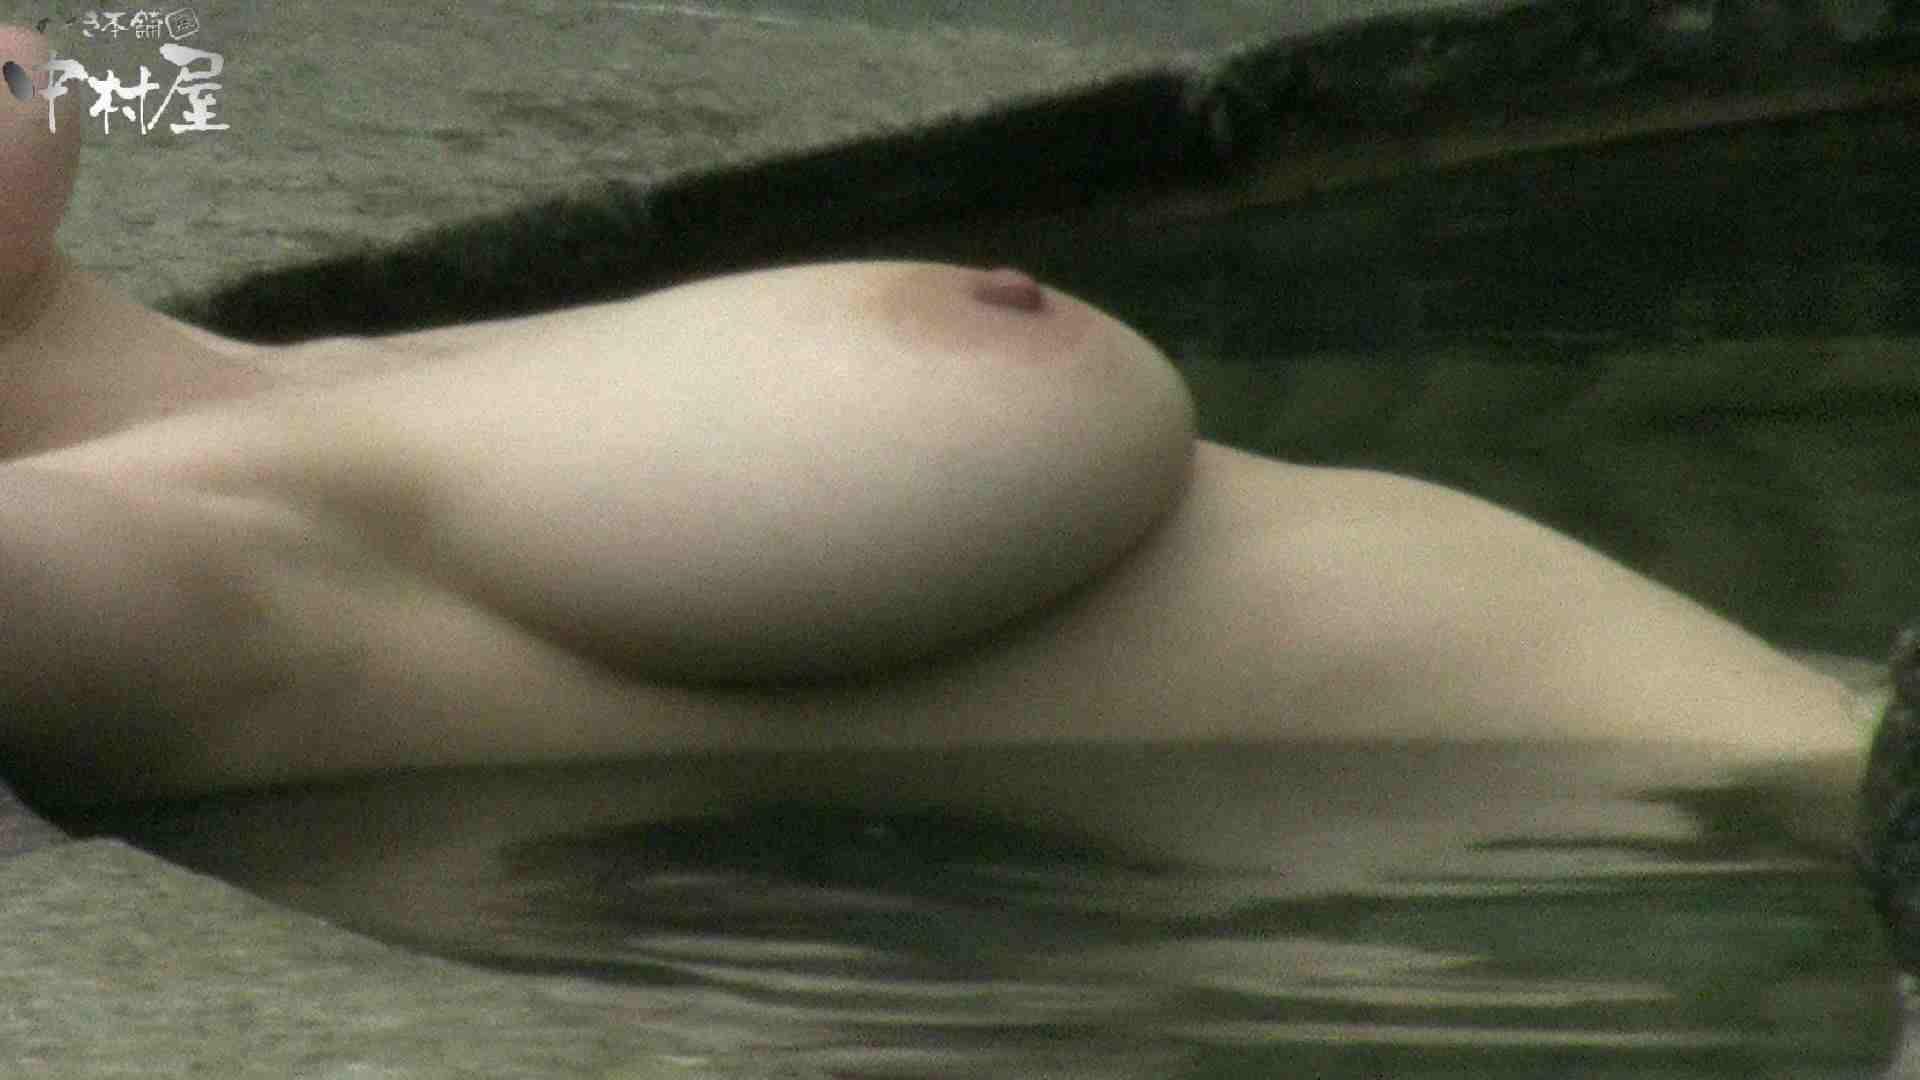 Aquaな露天風呂Vol.900 盗撮シリーズ | 露天風呂編  110PIX 17